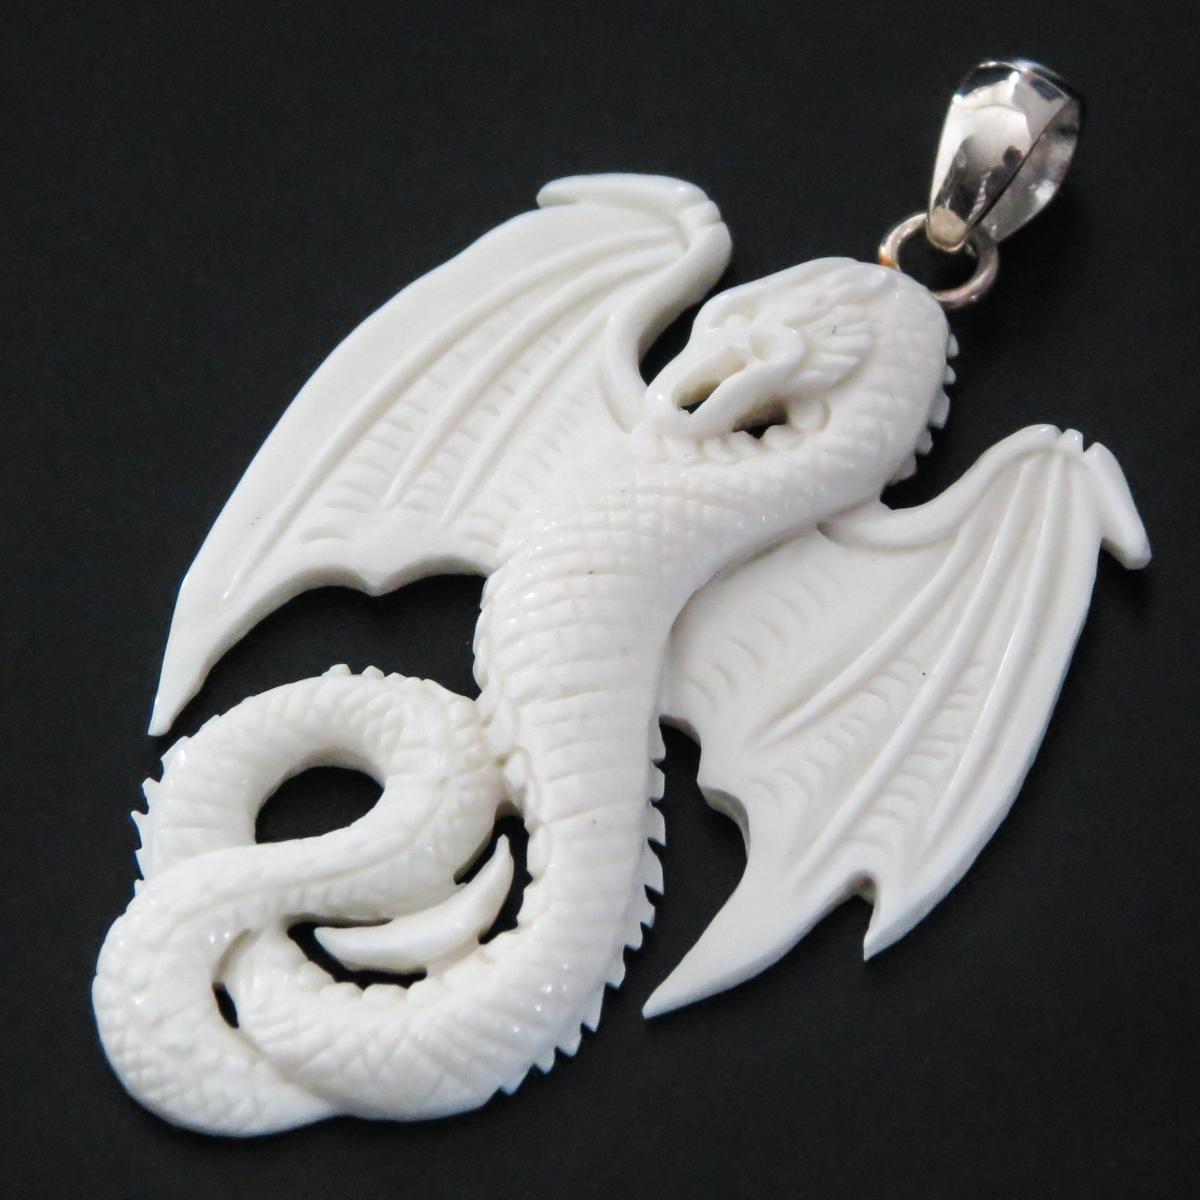 2 3 8 925 Silver Bison Bone Carving Dragon Us Pendant S4057 Fifirose